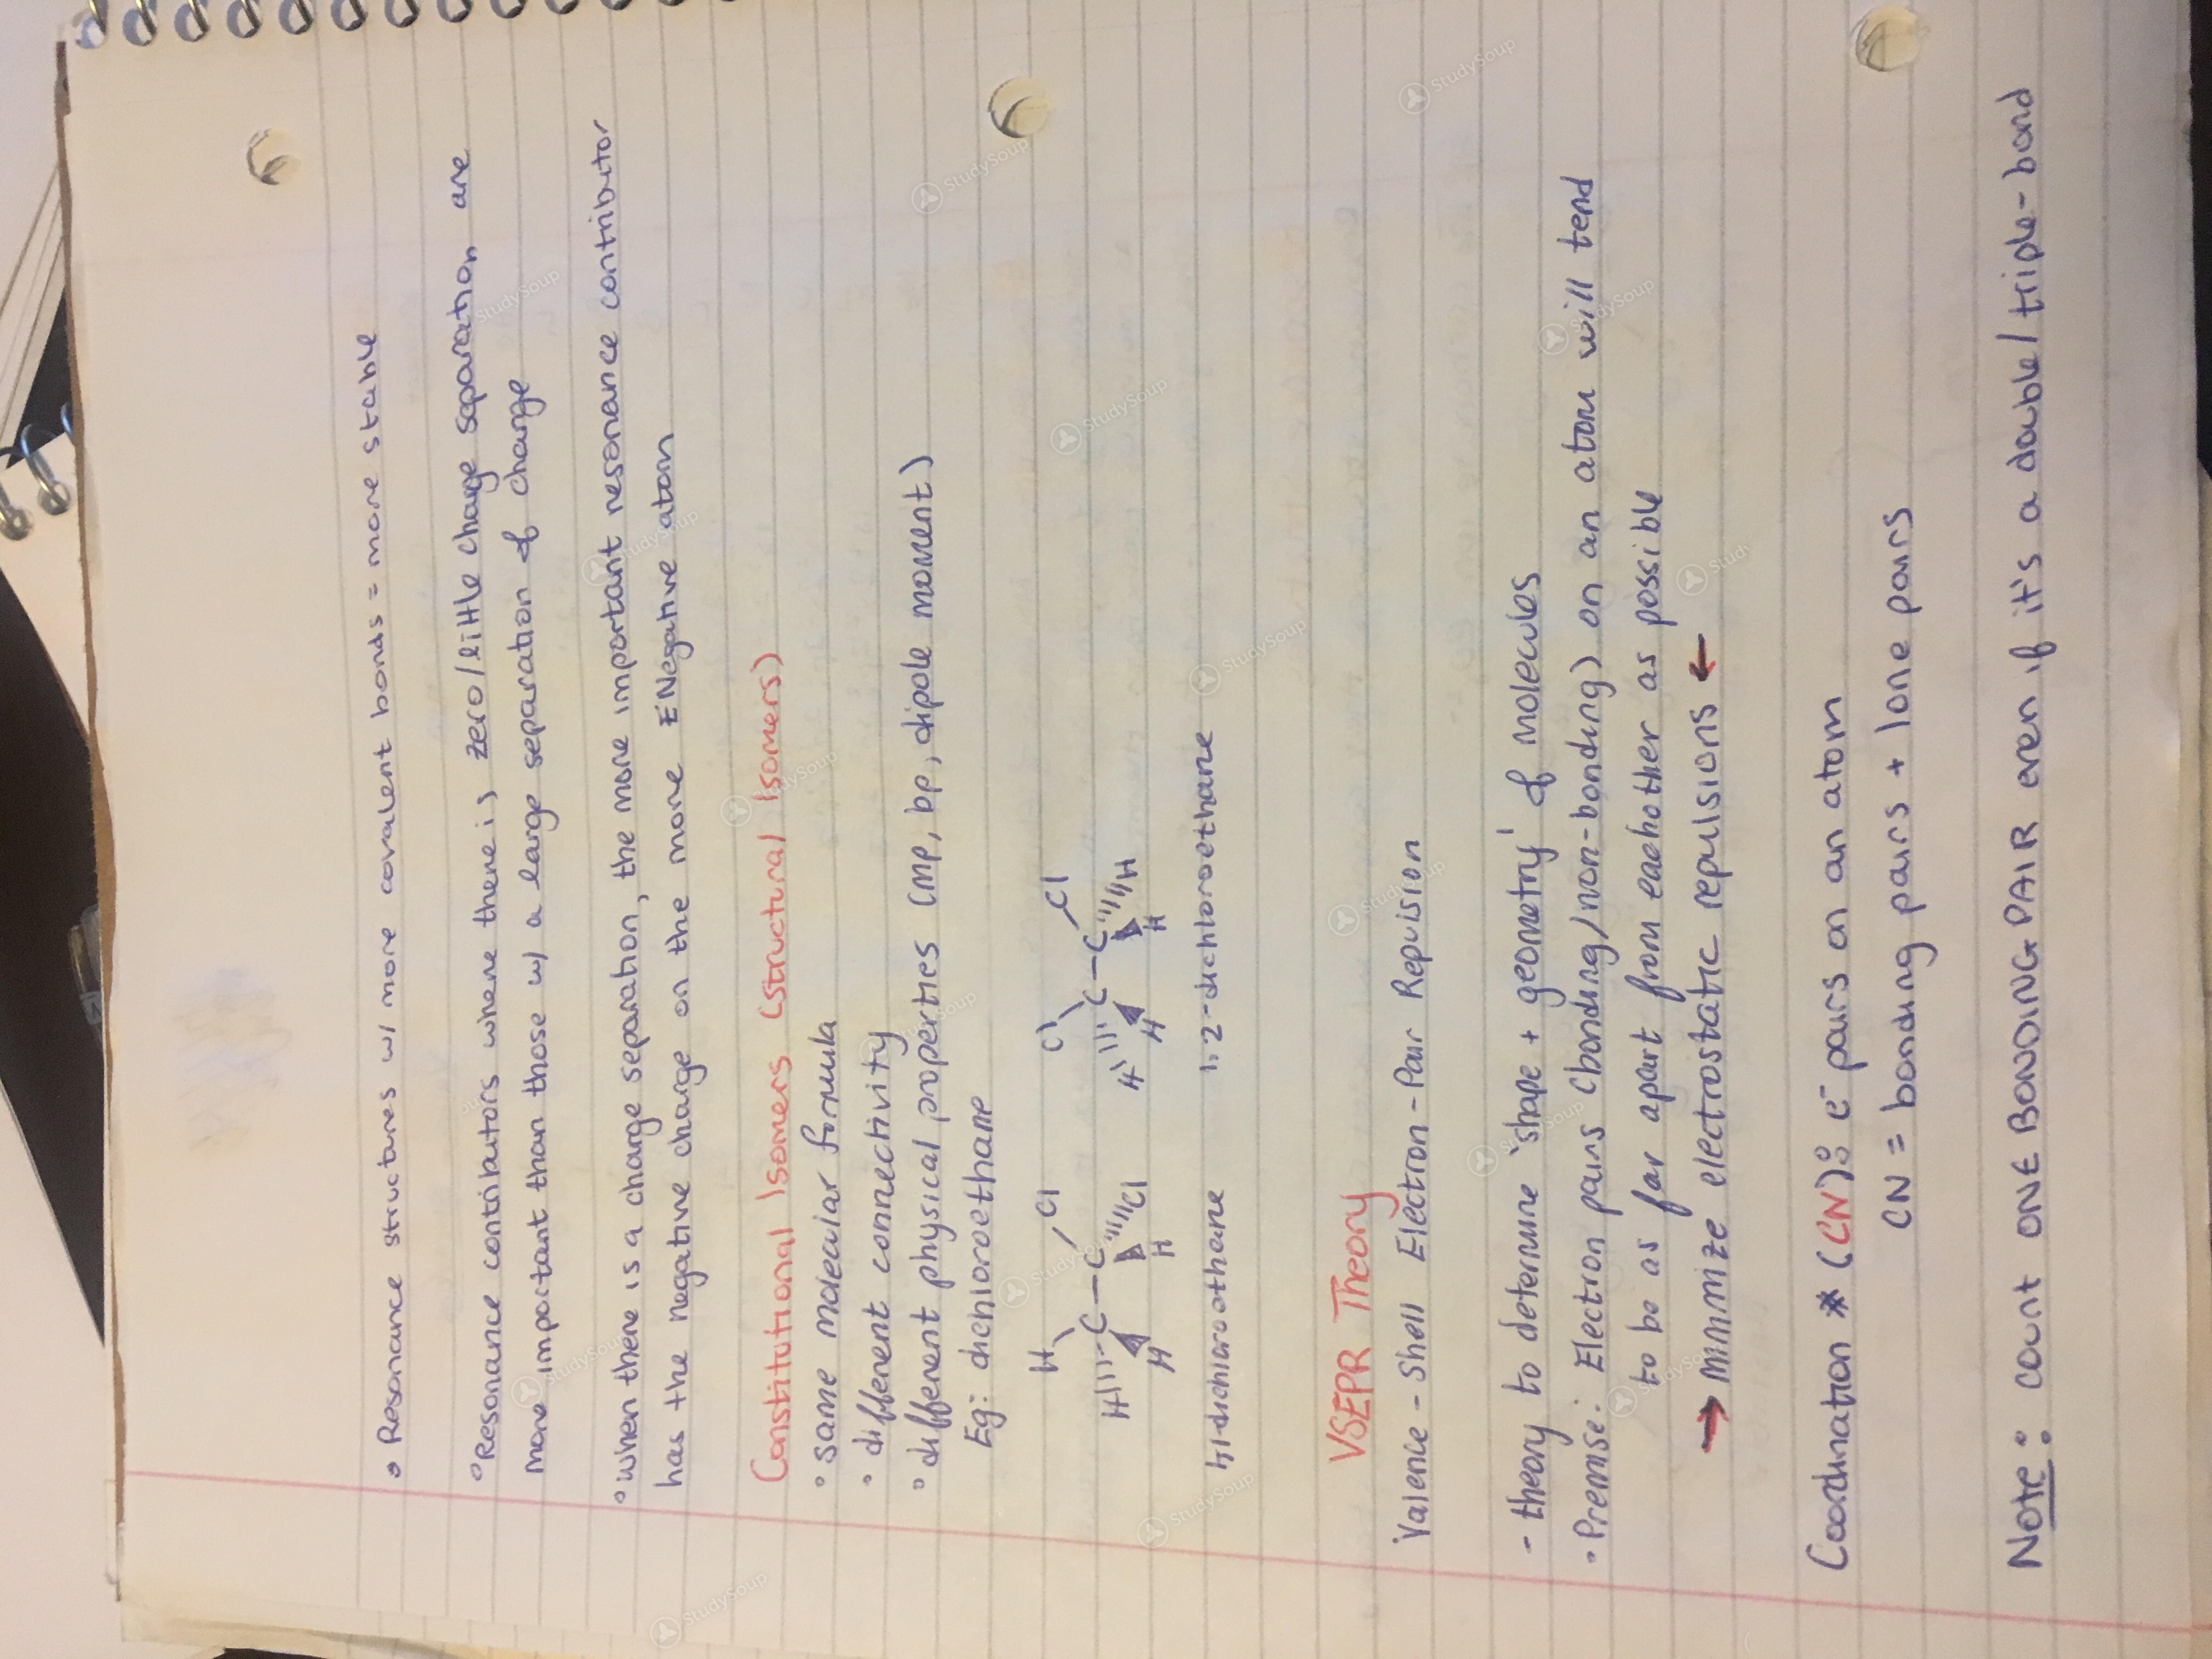 Concordia University - CHEM 221 - Class Notes - Week 3   StudySoup